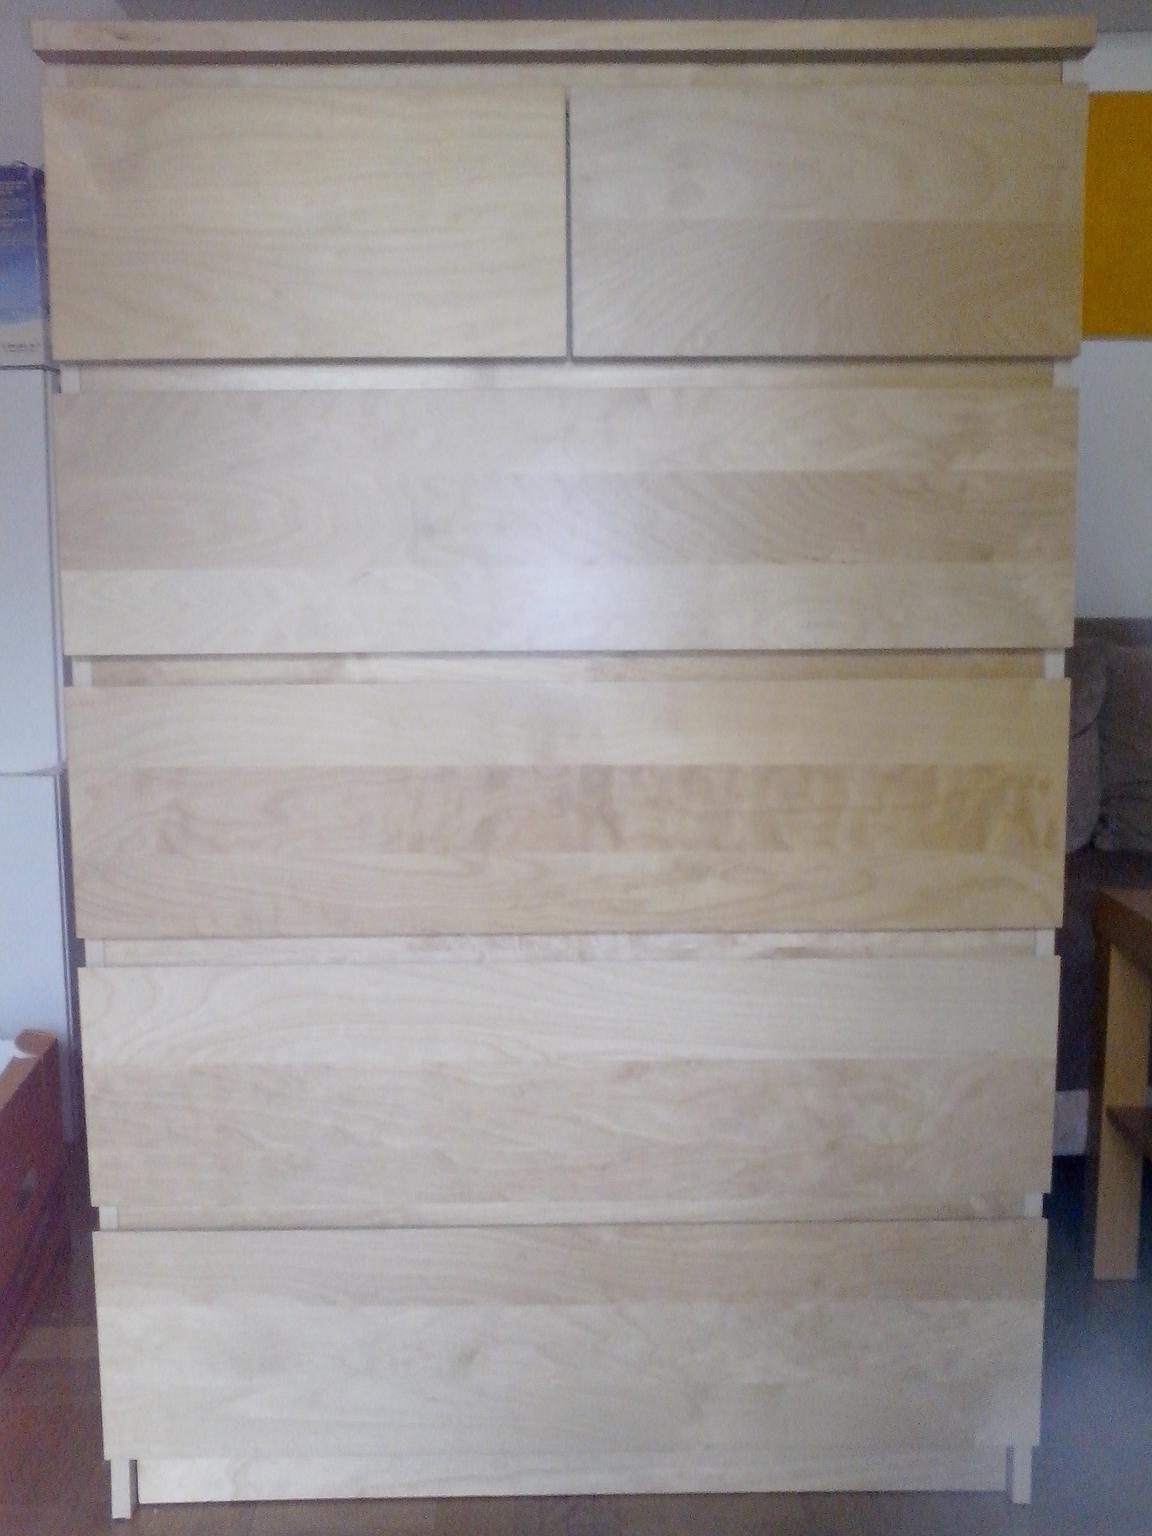 Ikea Malm Kommode Birke  Malm Kommode Birke 6 Schubladen amuda